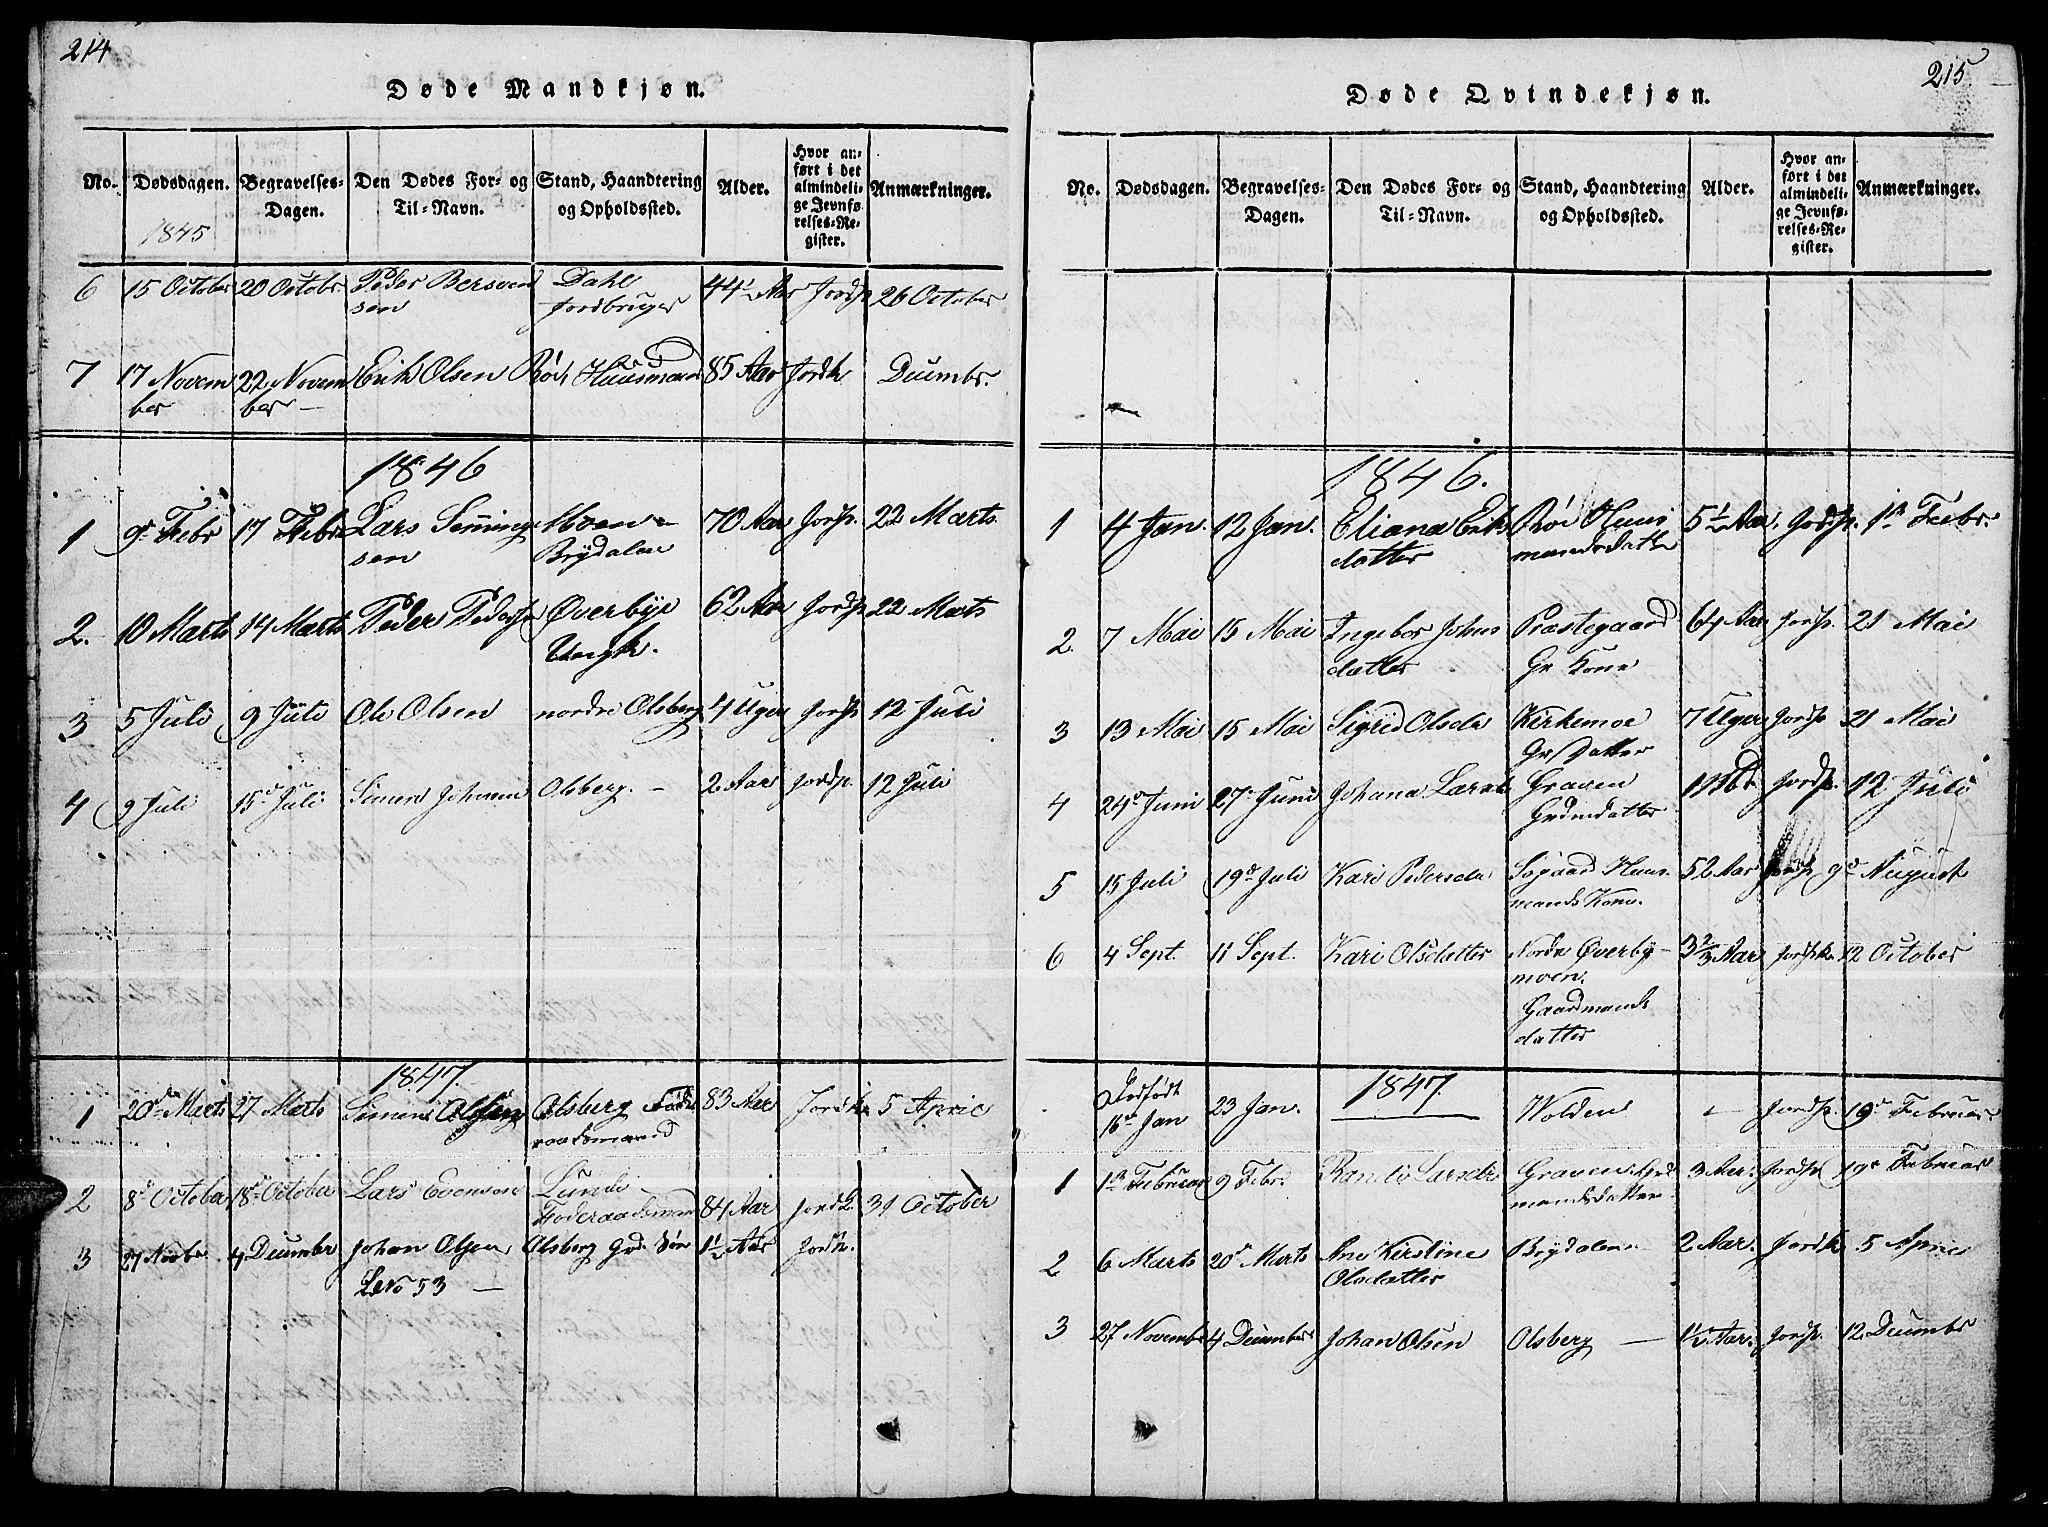 SAH, Tynset prestekontor, Klokkerbok nr. 4, 1814-1879, s. 214-215